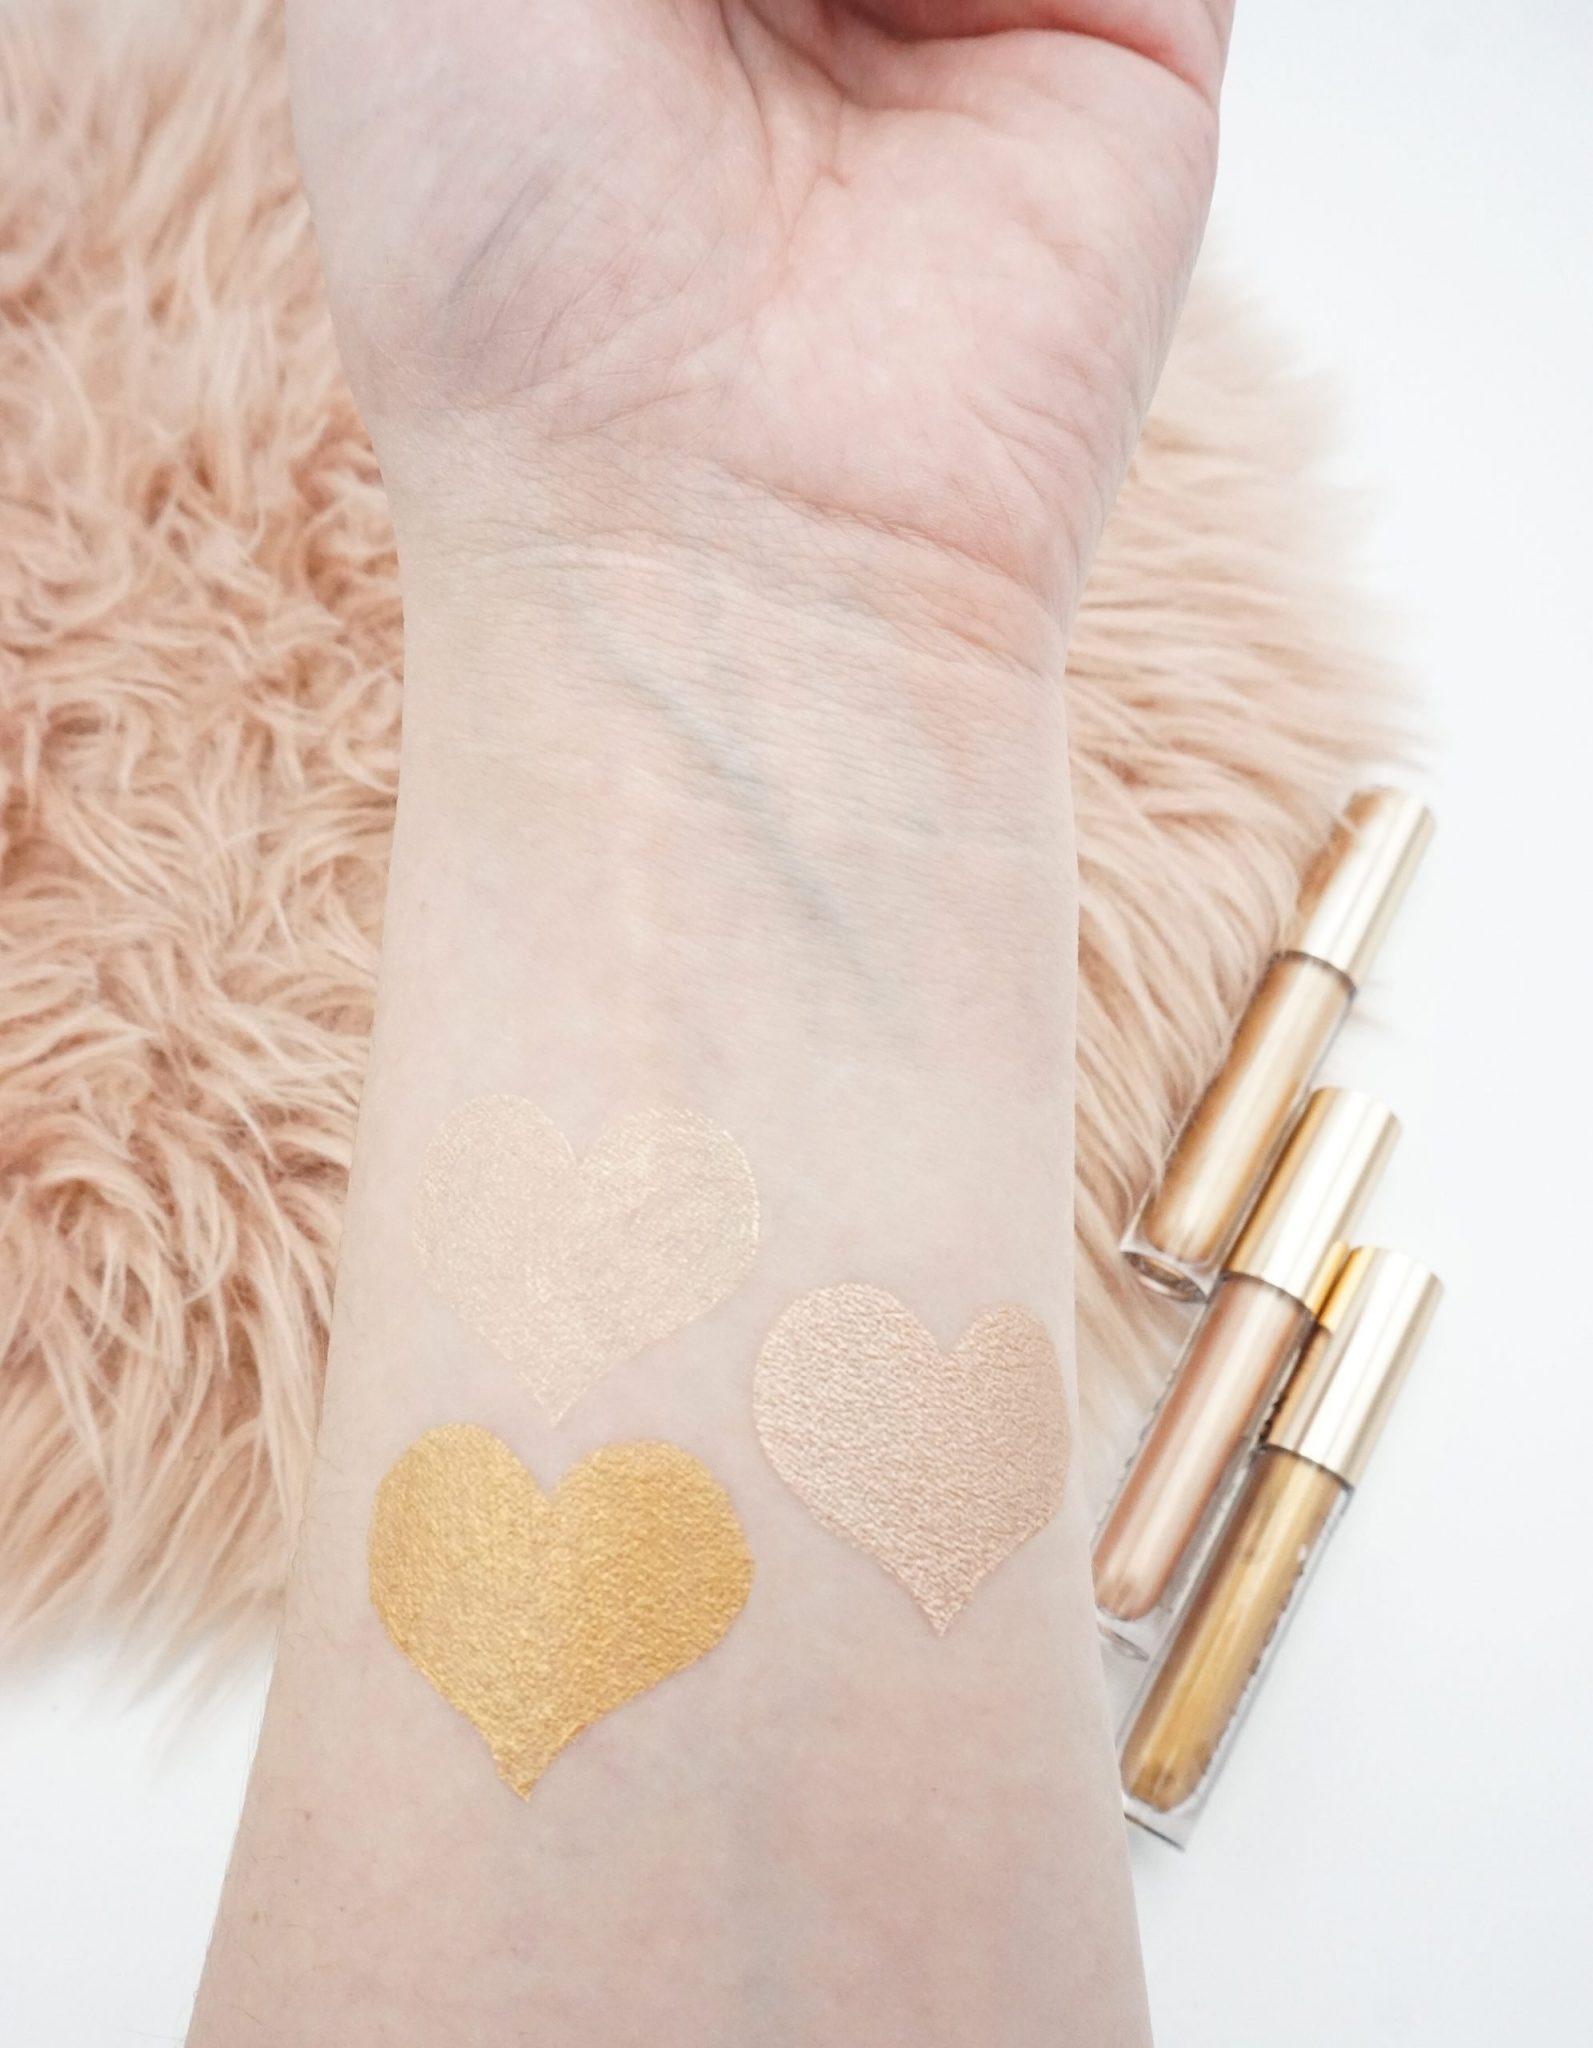 Bali Body Highlighter Sticks Review ⋆ Beautymone